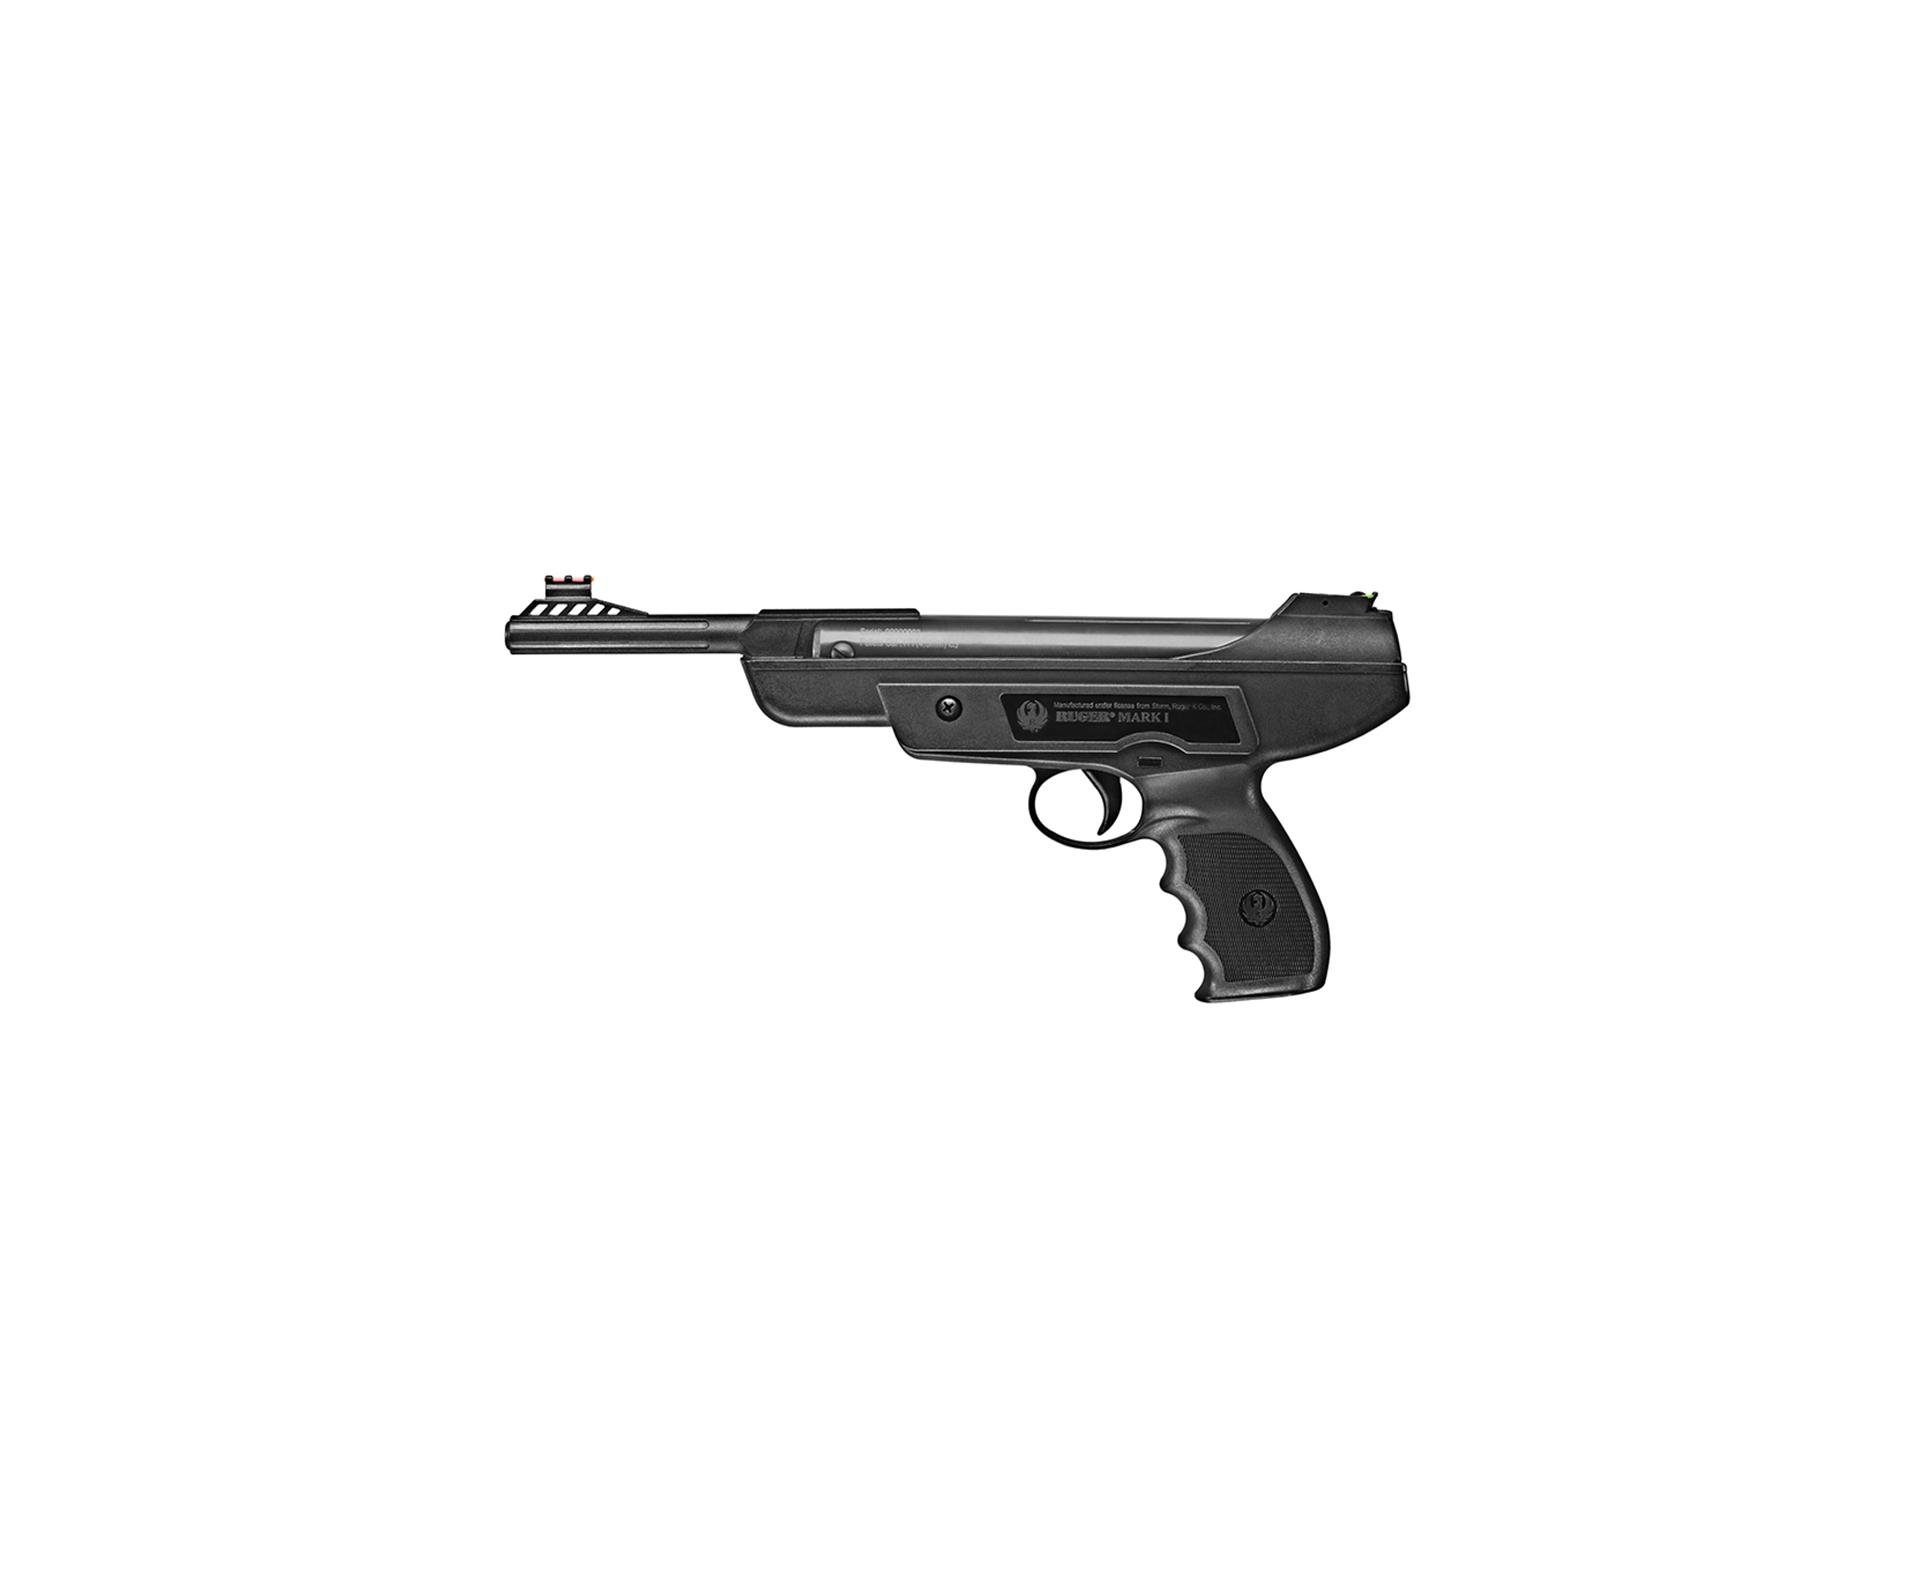 Pistola De Pressão Mark I Cal. 4,5mm - Ruger